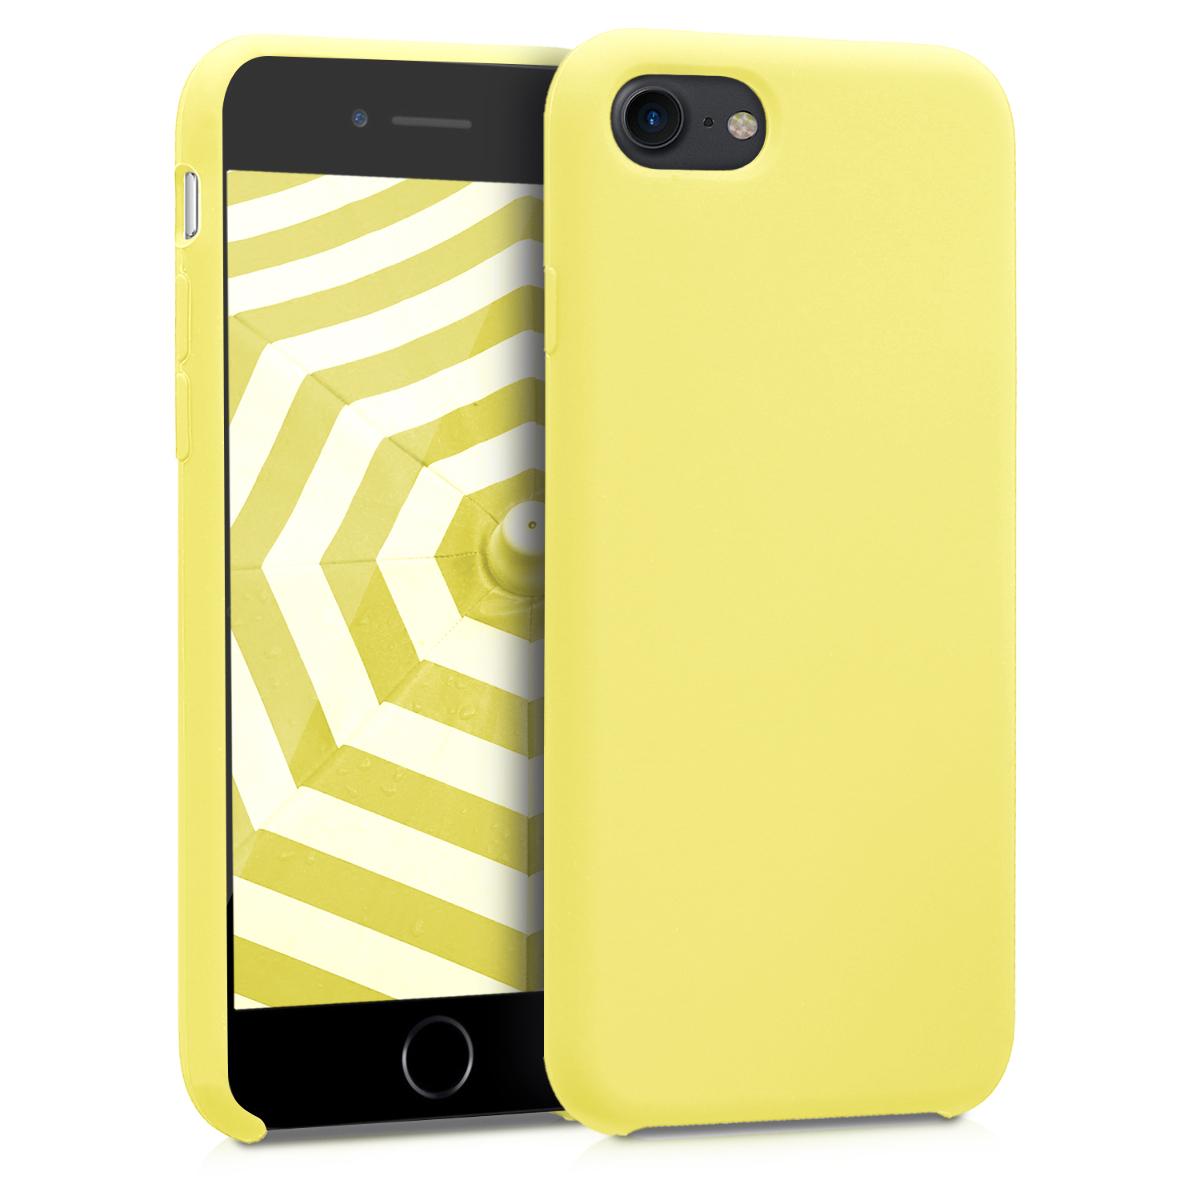 KW TPU Θήκη Σιλικόνης Apple iPhone 7 / 8 - Pastel Yellow (40225.30)